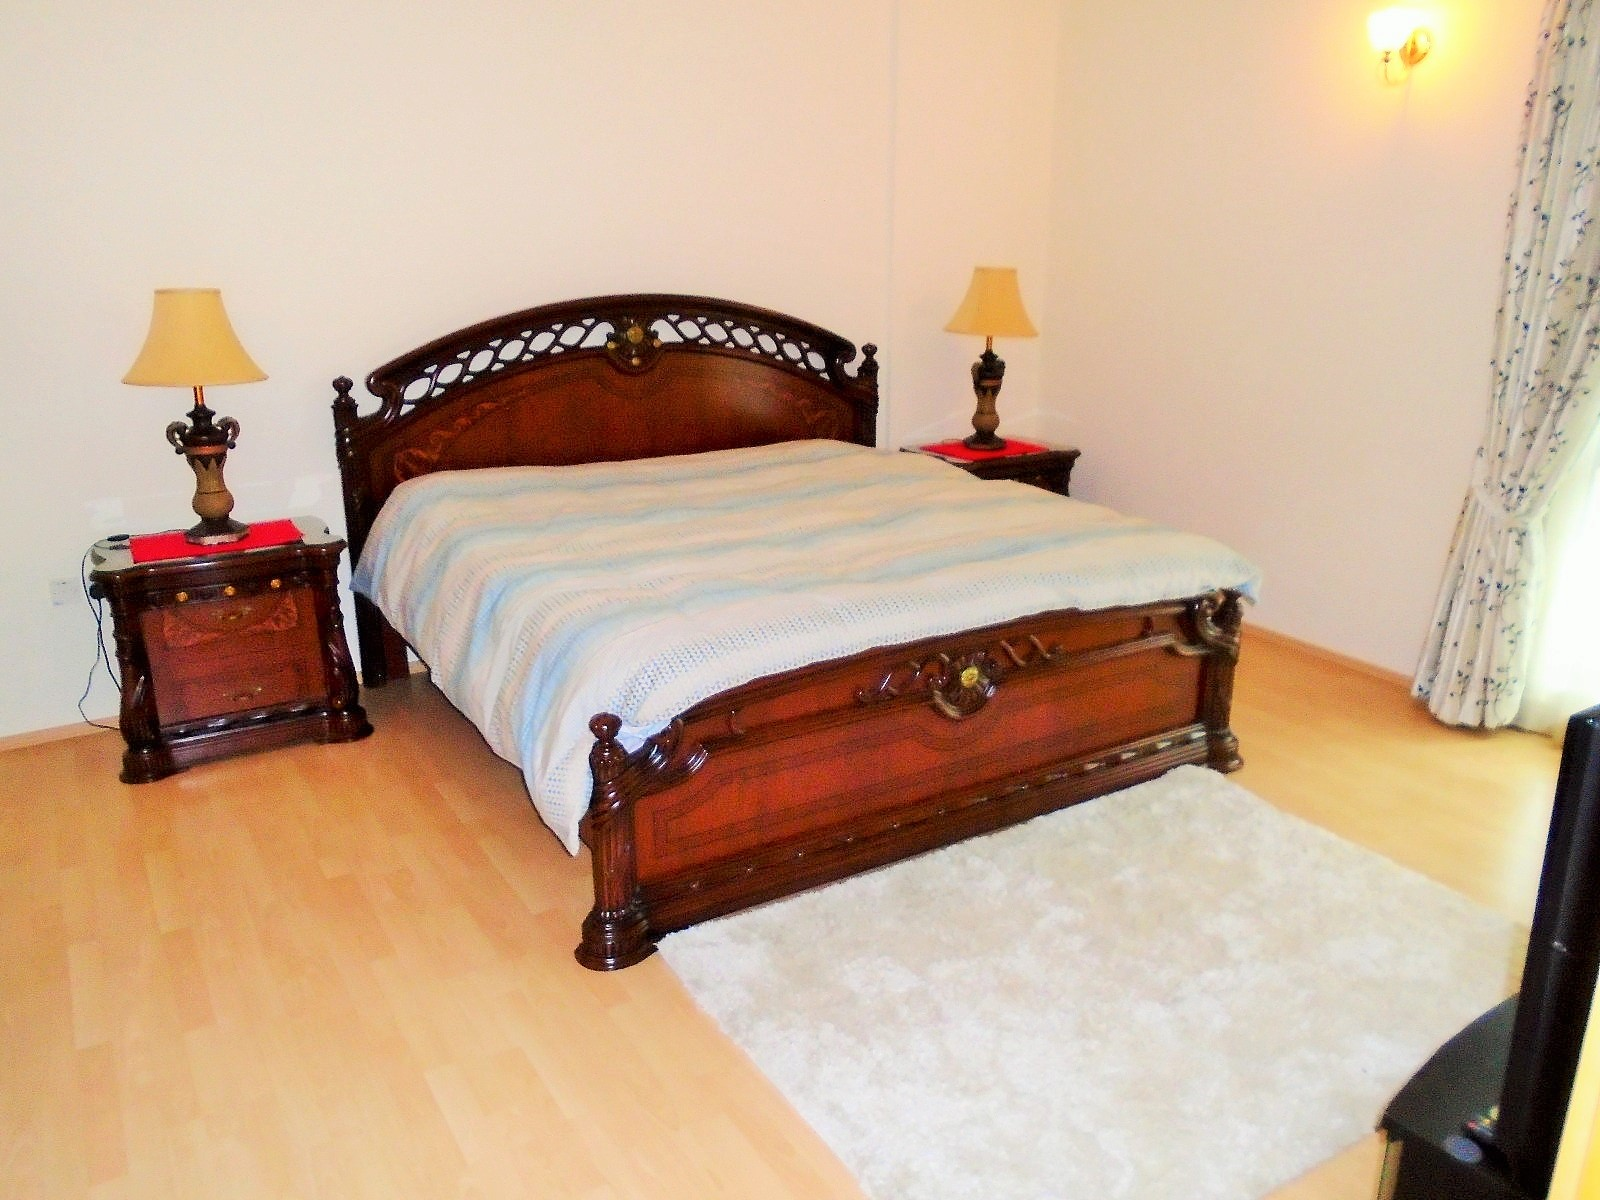 2 Bedroom Dublex 4